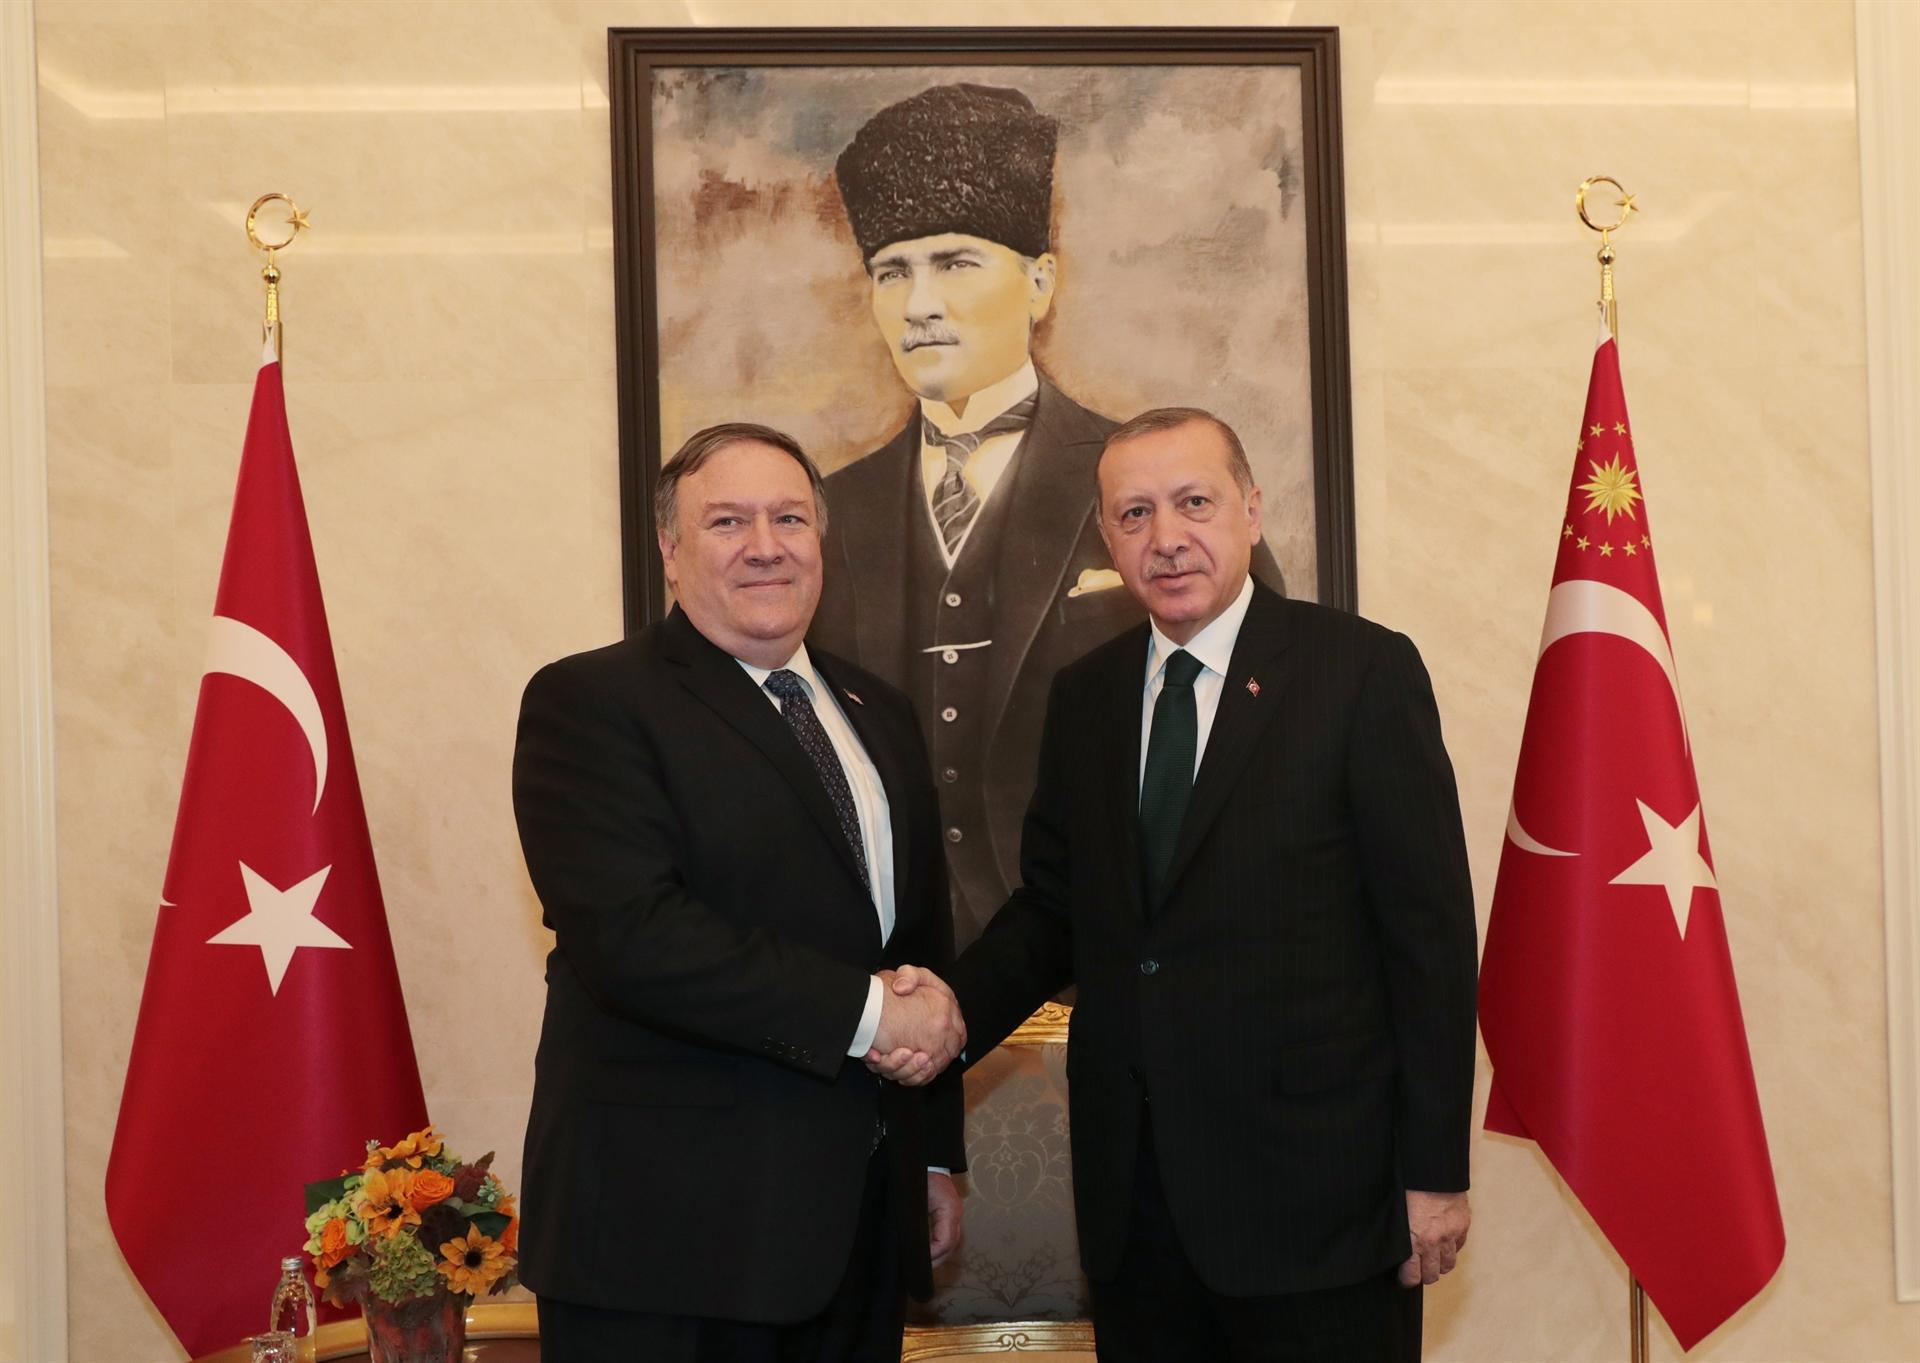 Pompeo Ankara'da https://t.co/R4vOZ8s2aY https://t.co/VKkI75Ut8t